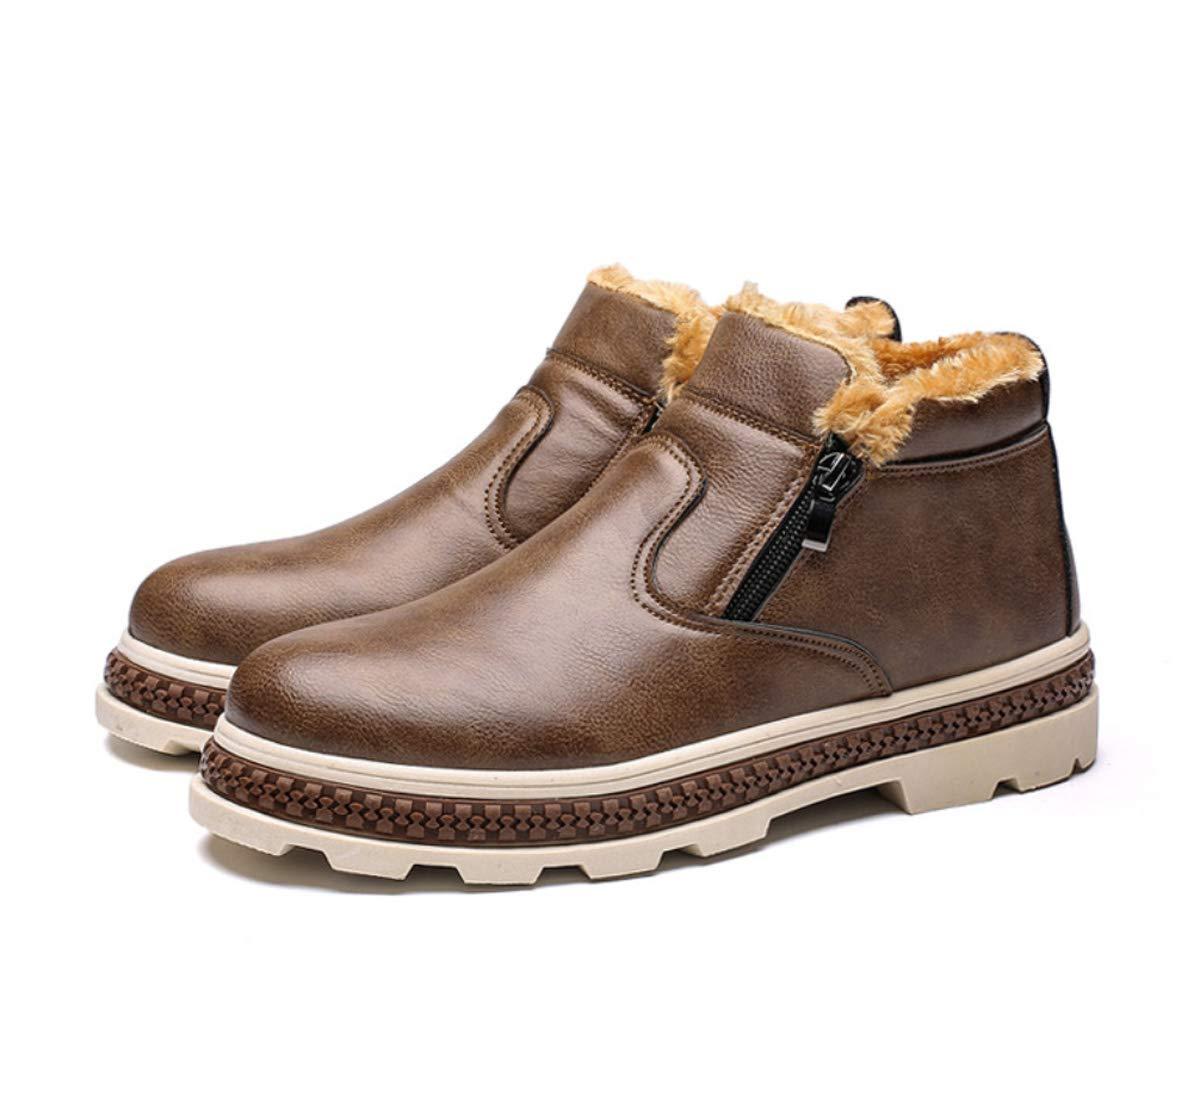 DANDANJIE Herrenschuhe Winter Warm Leder Schuhe Stiefel 2018 Casual Schneestiefel Turnschuhe